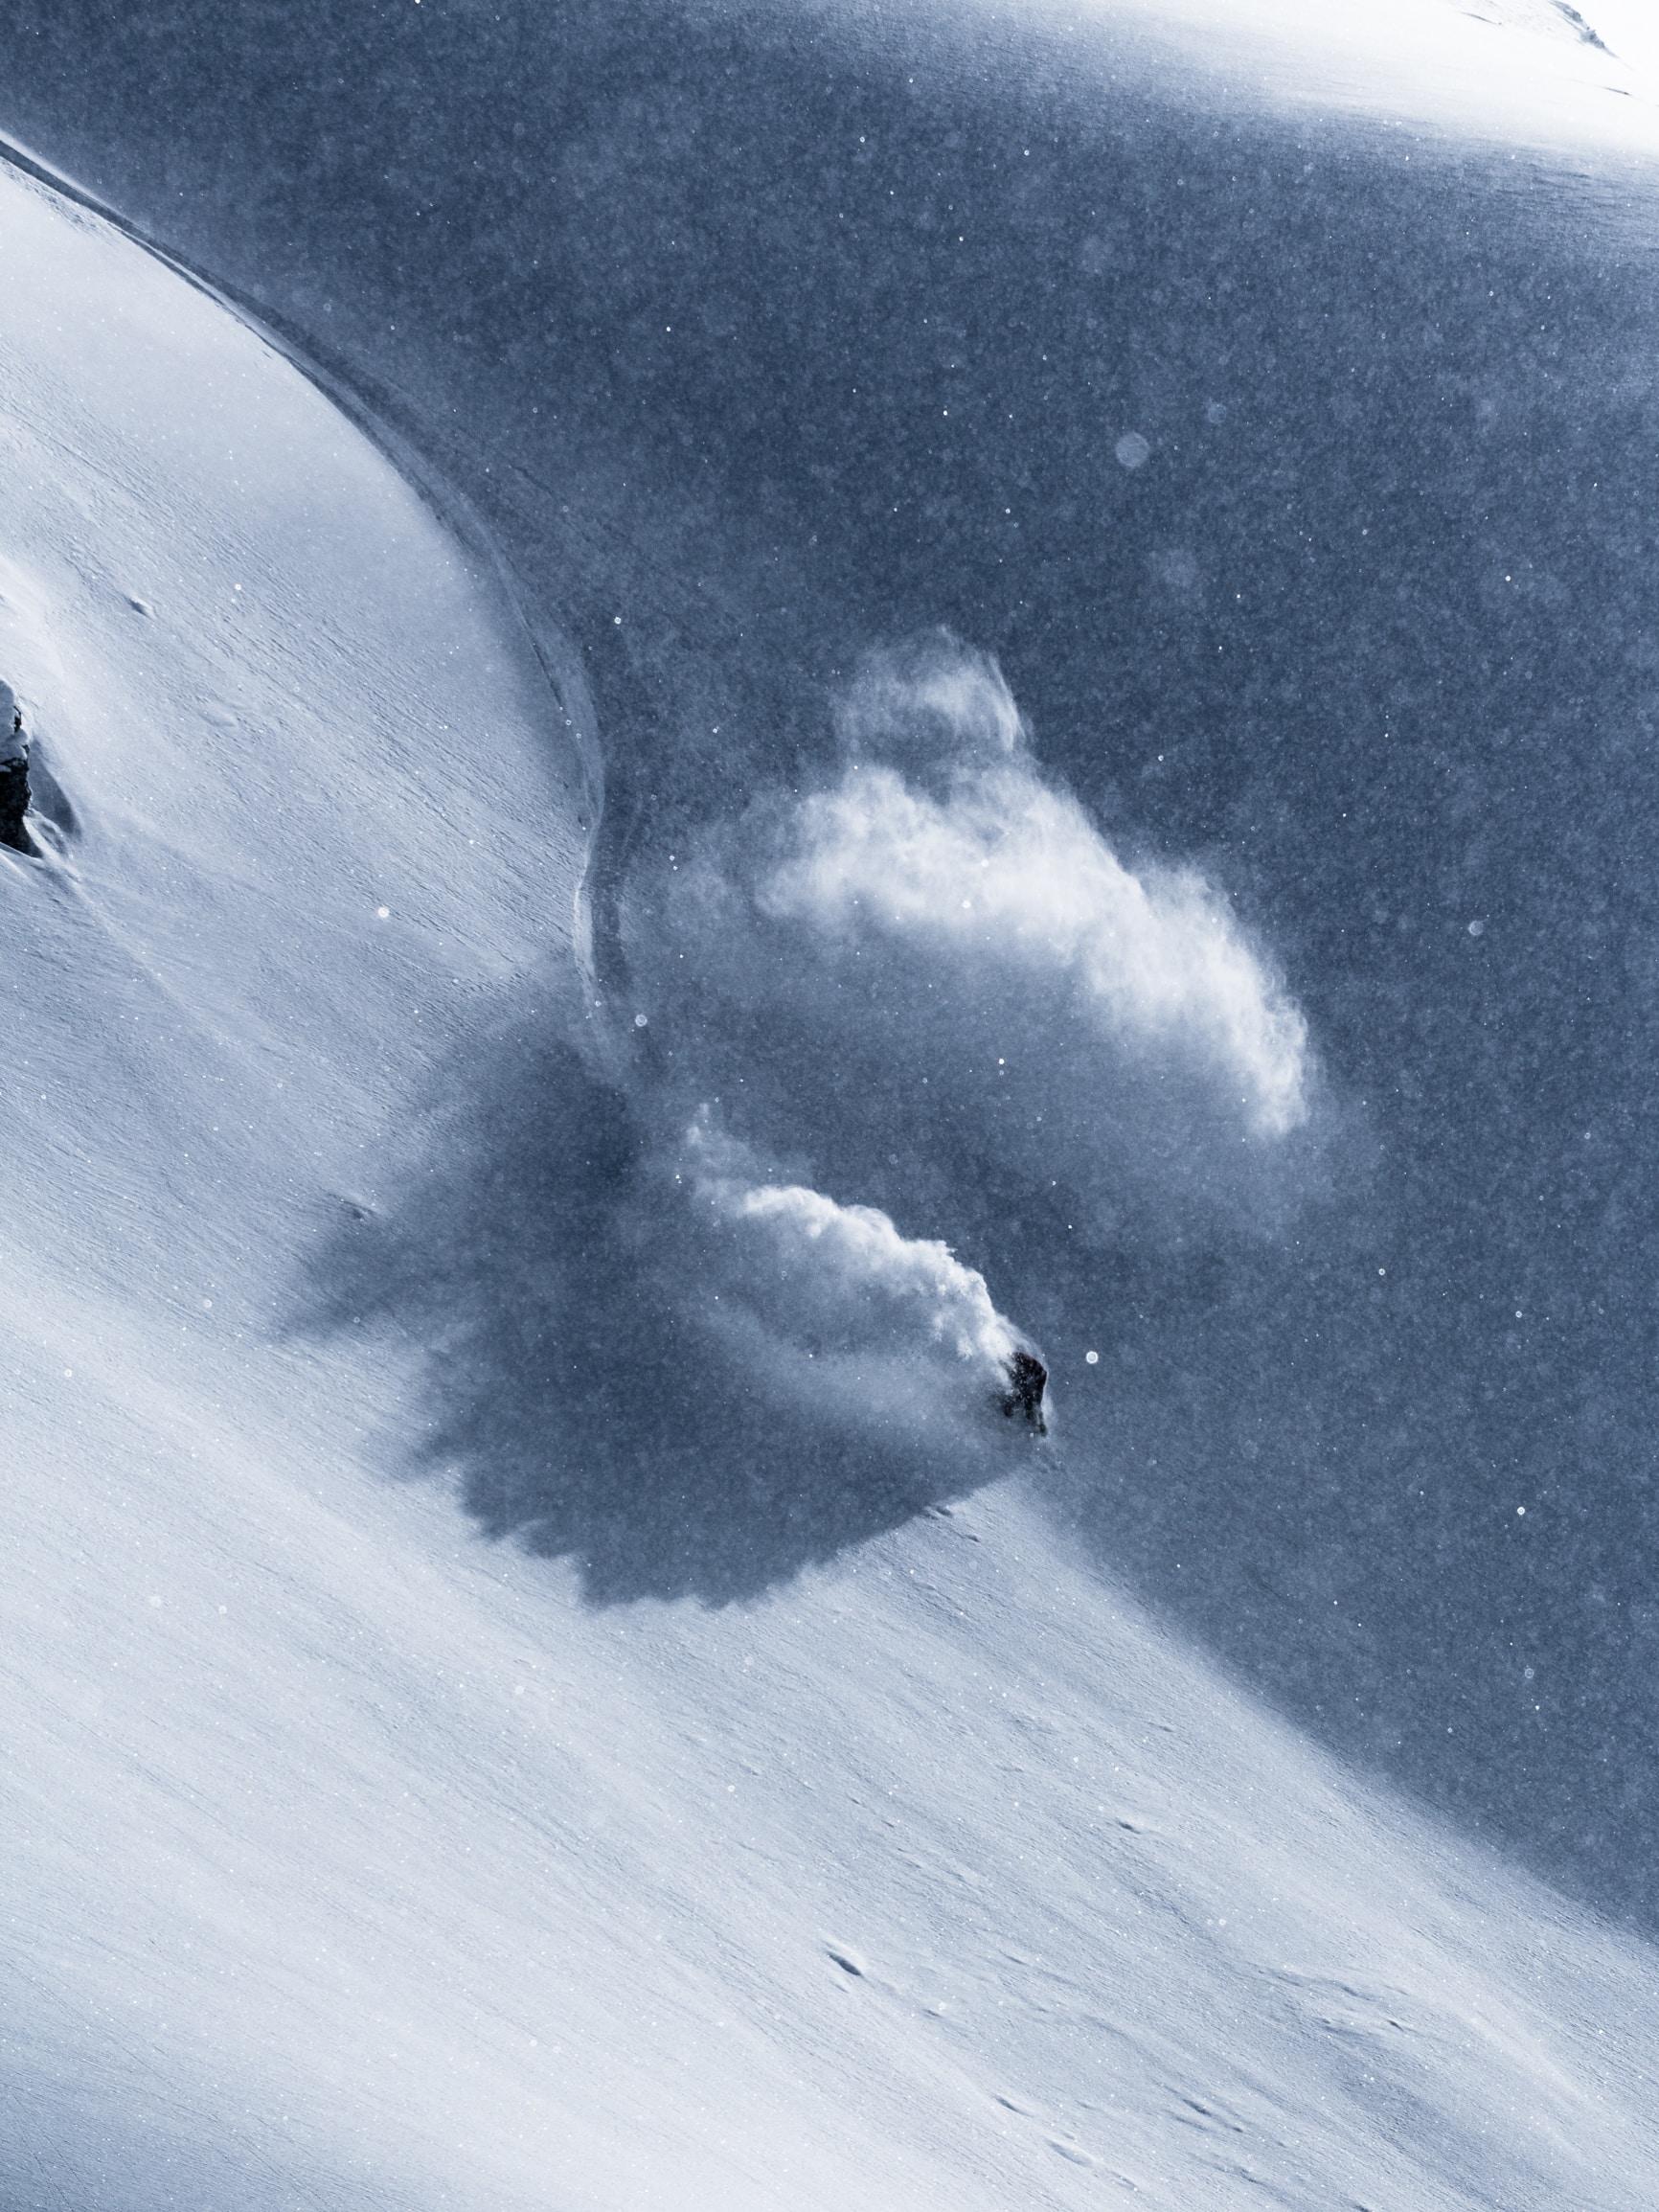 person snowboarding on tundra